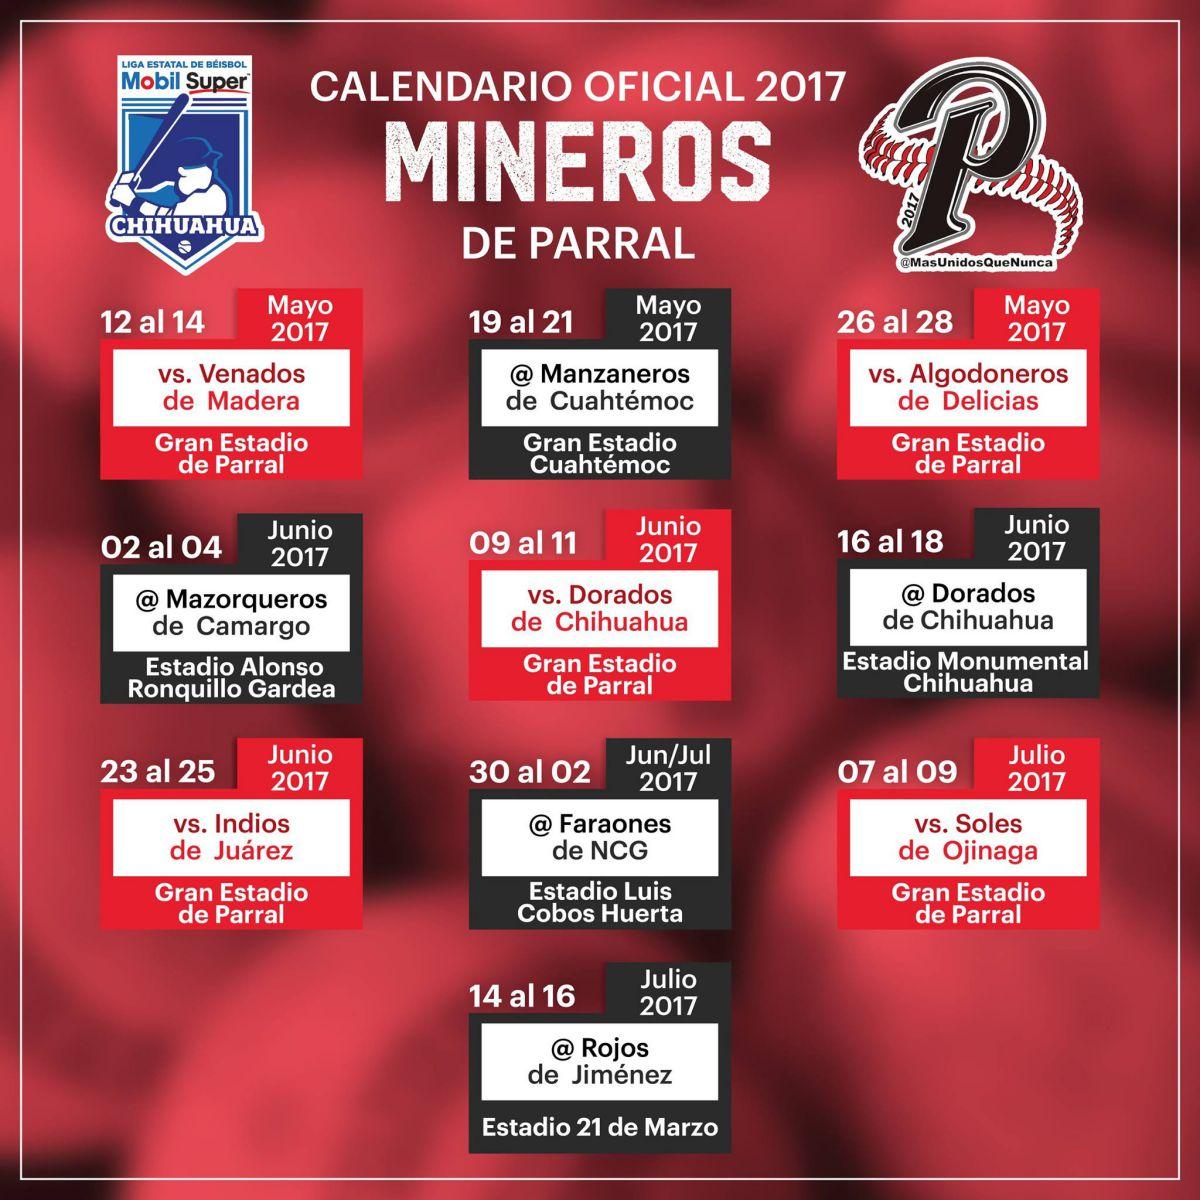 mineros calendario beisbol chihuahua 2017